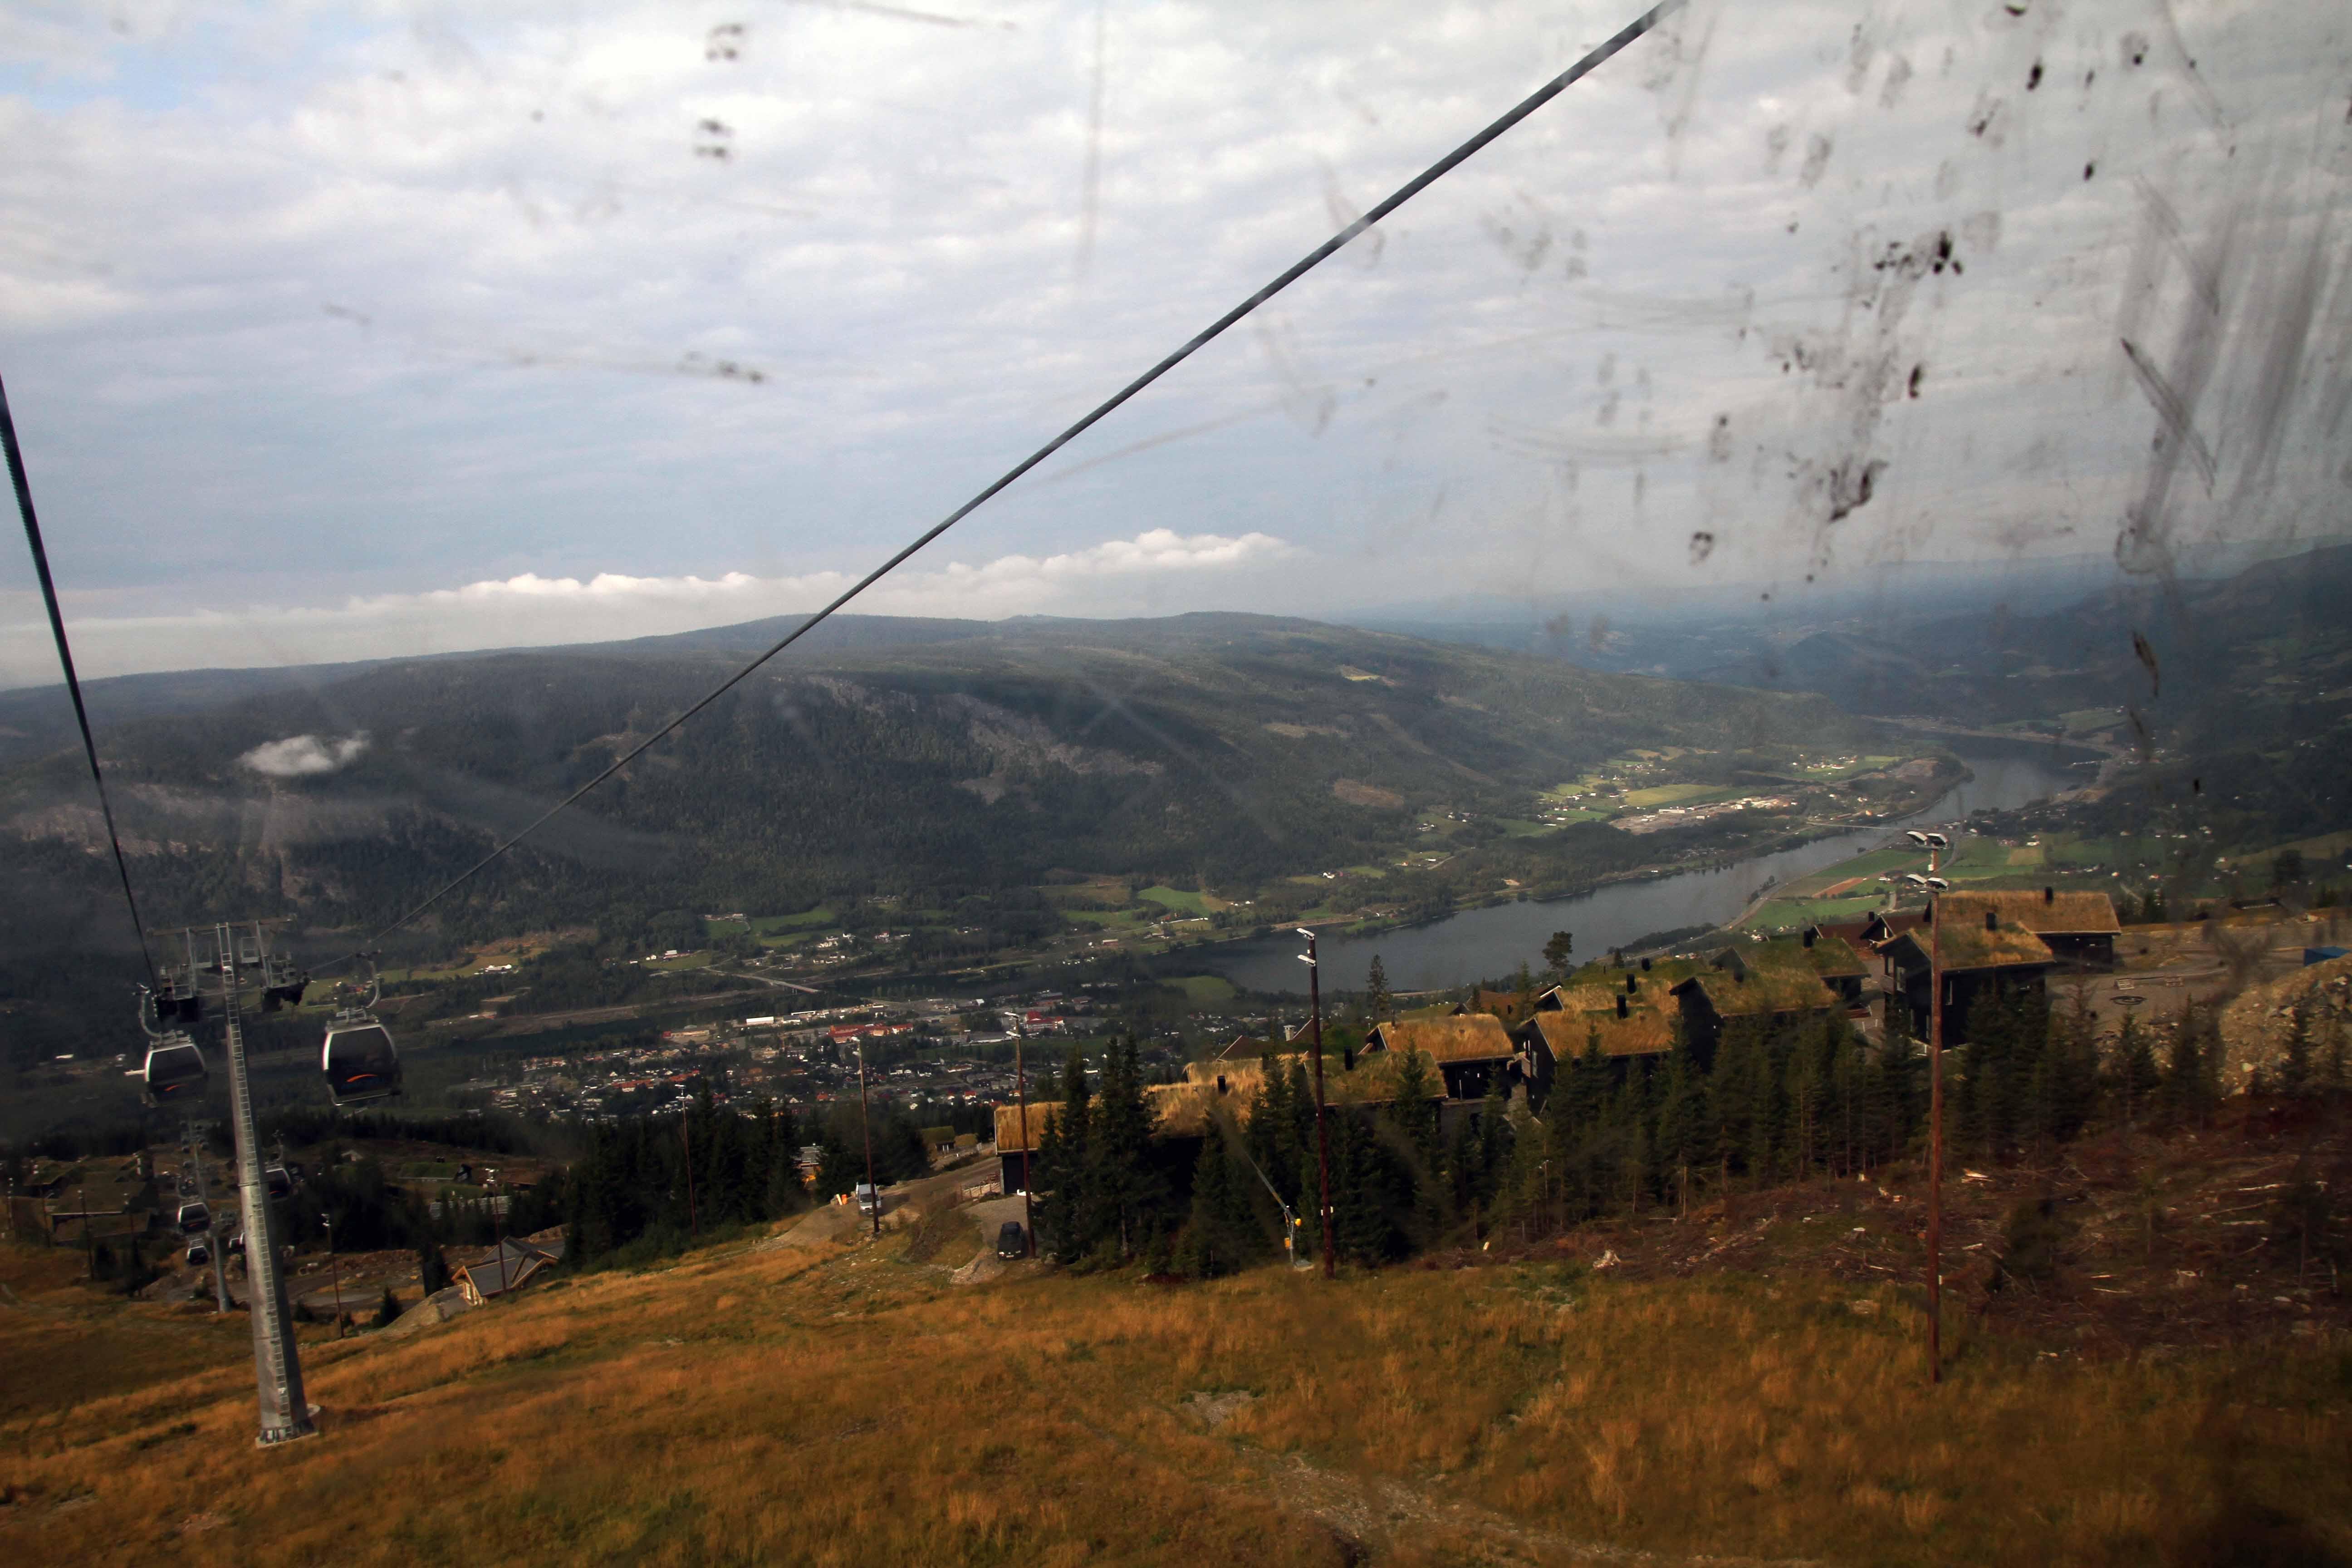 Die Aussicht aus dem Lift in Hafjell ist der absolute Wahnsinn.